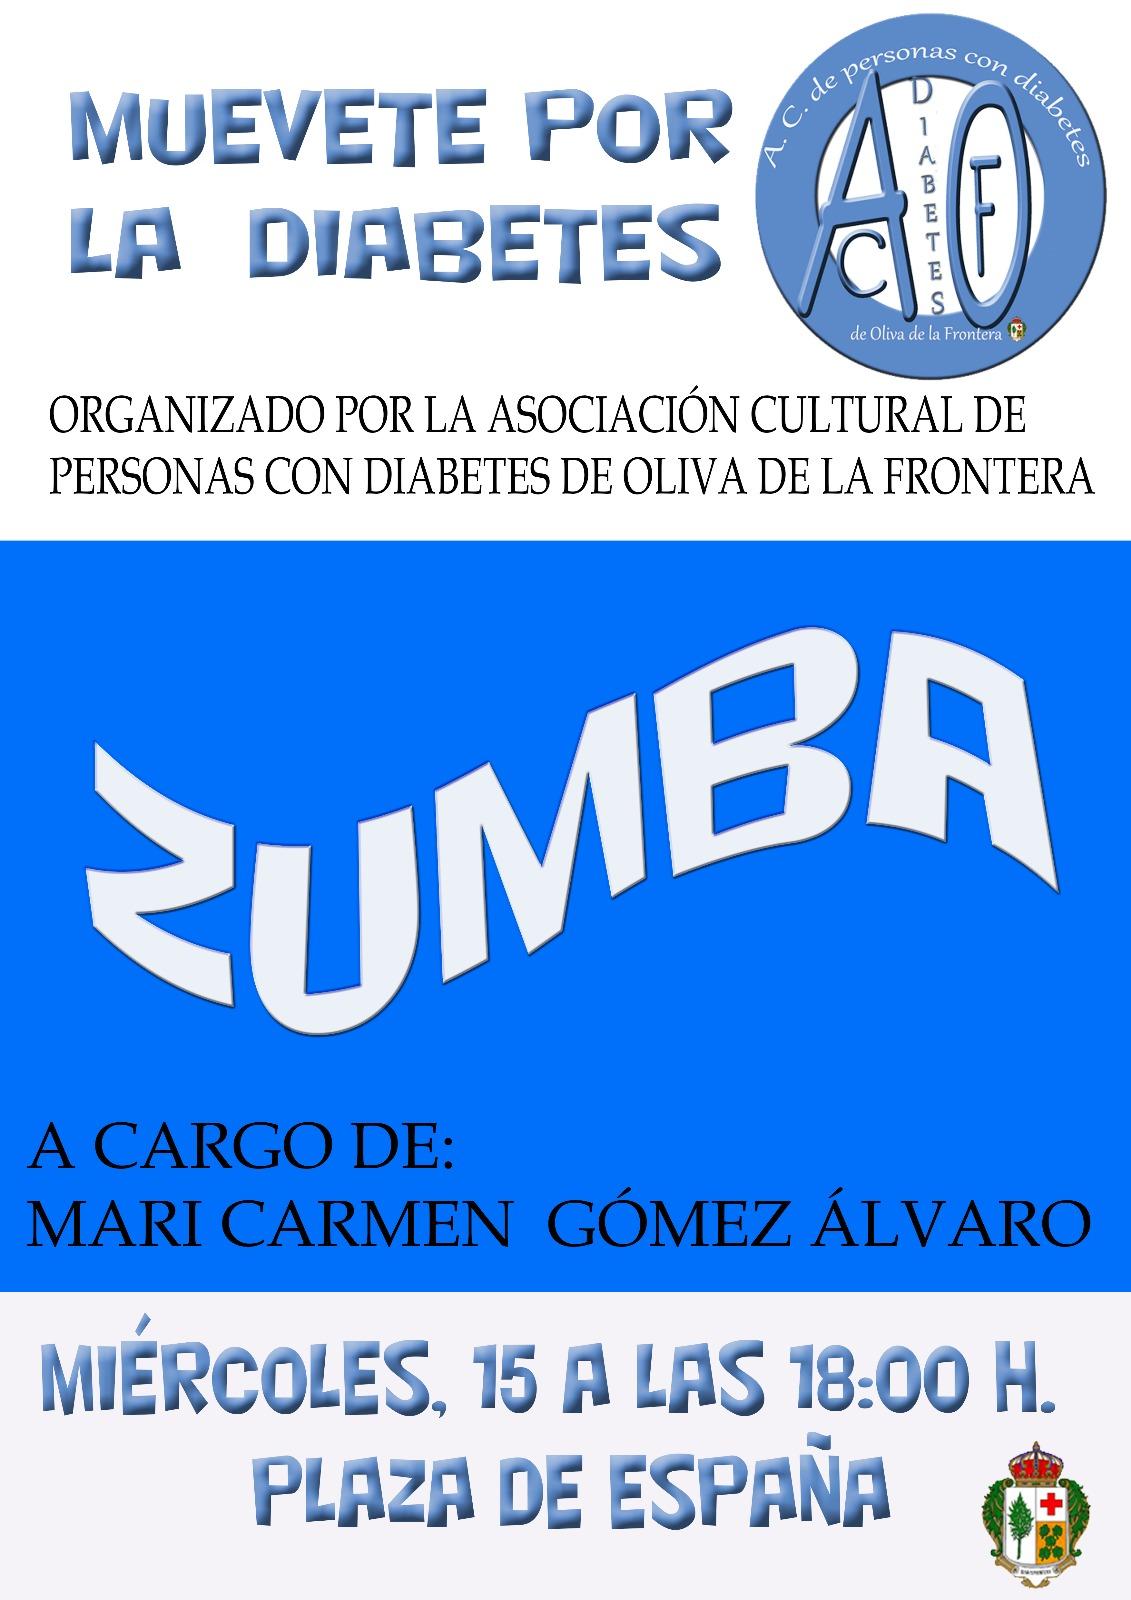 muevete por la diabetes